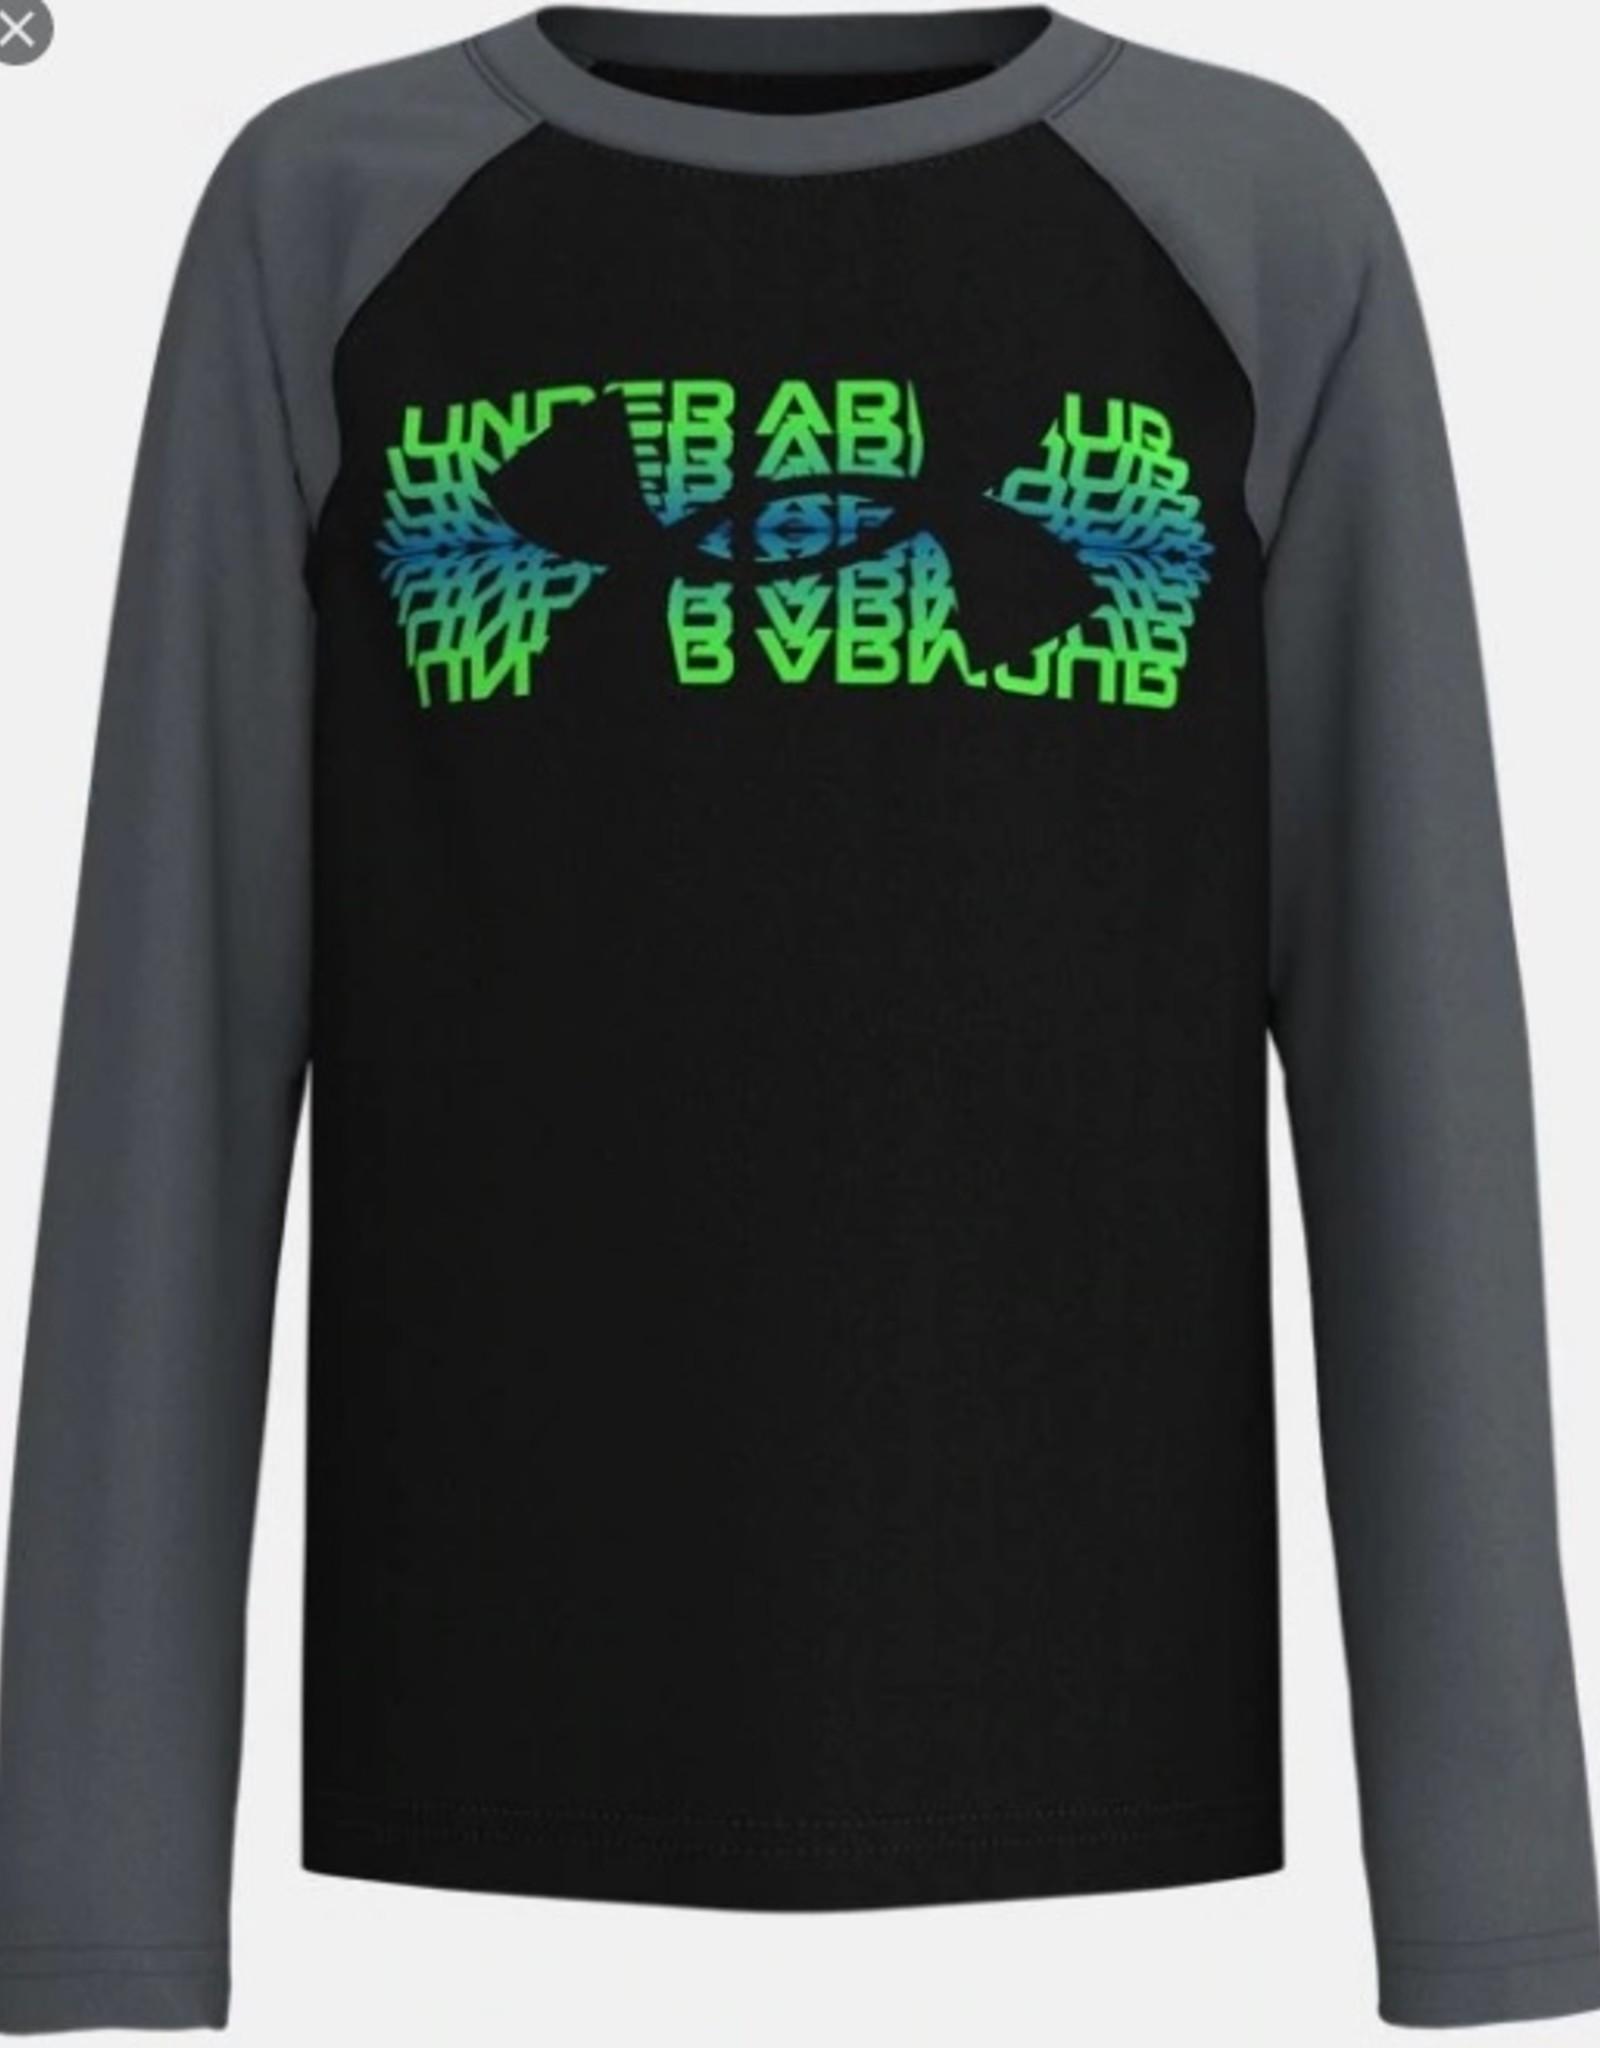 Under Armour Under Armour - Gradient Fade L/S T-Shirt